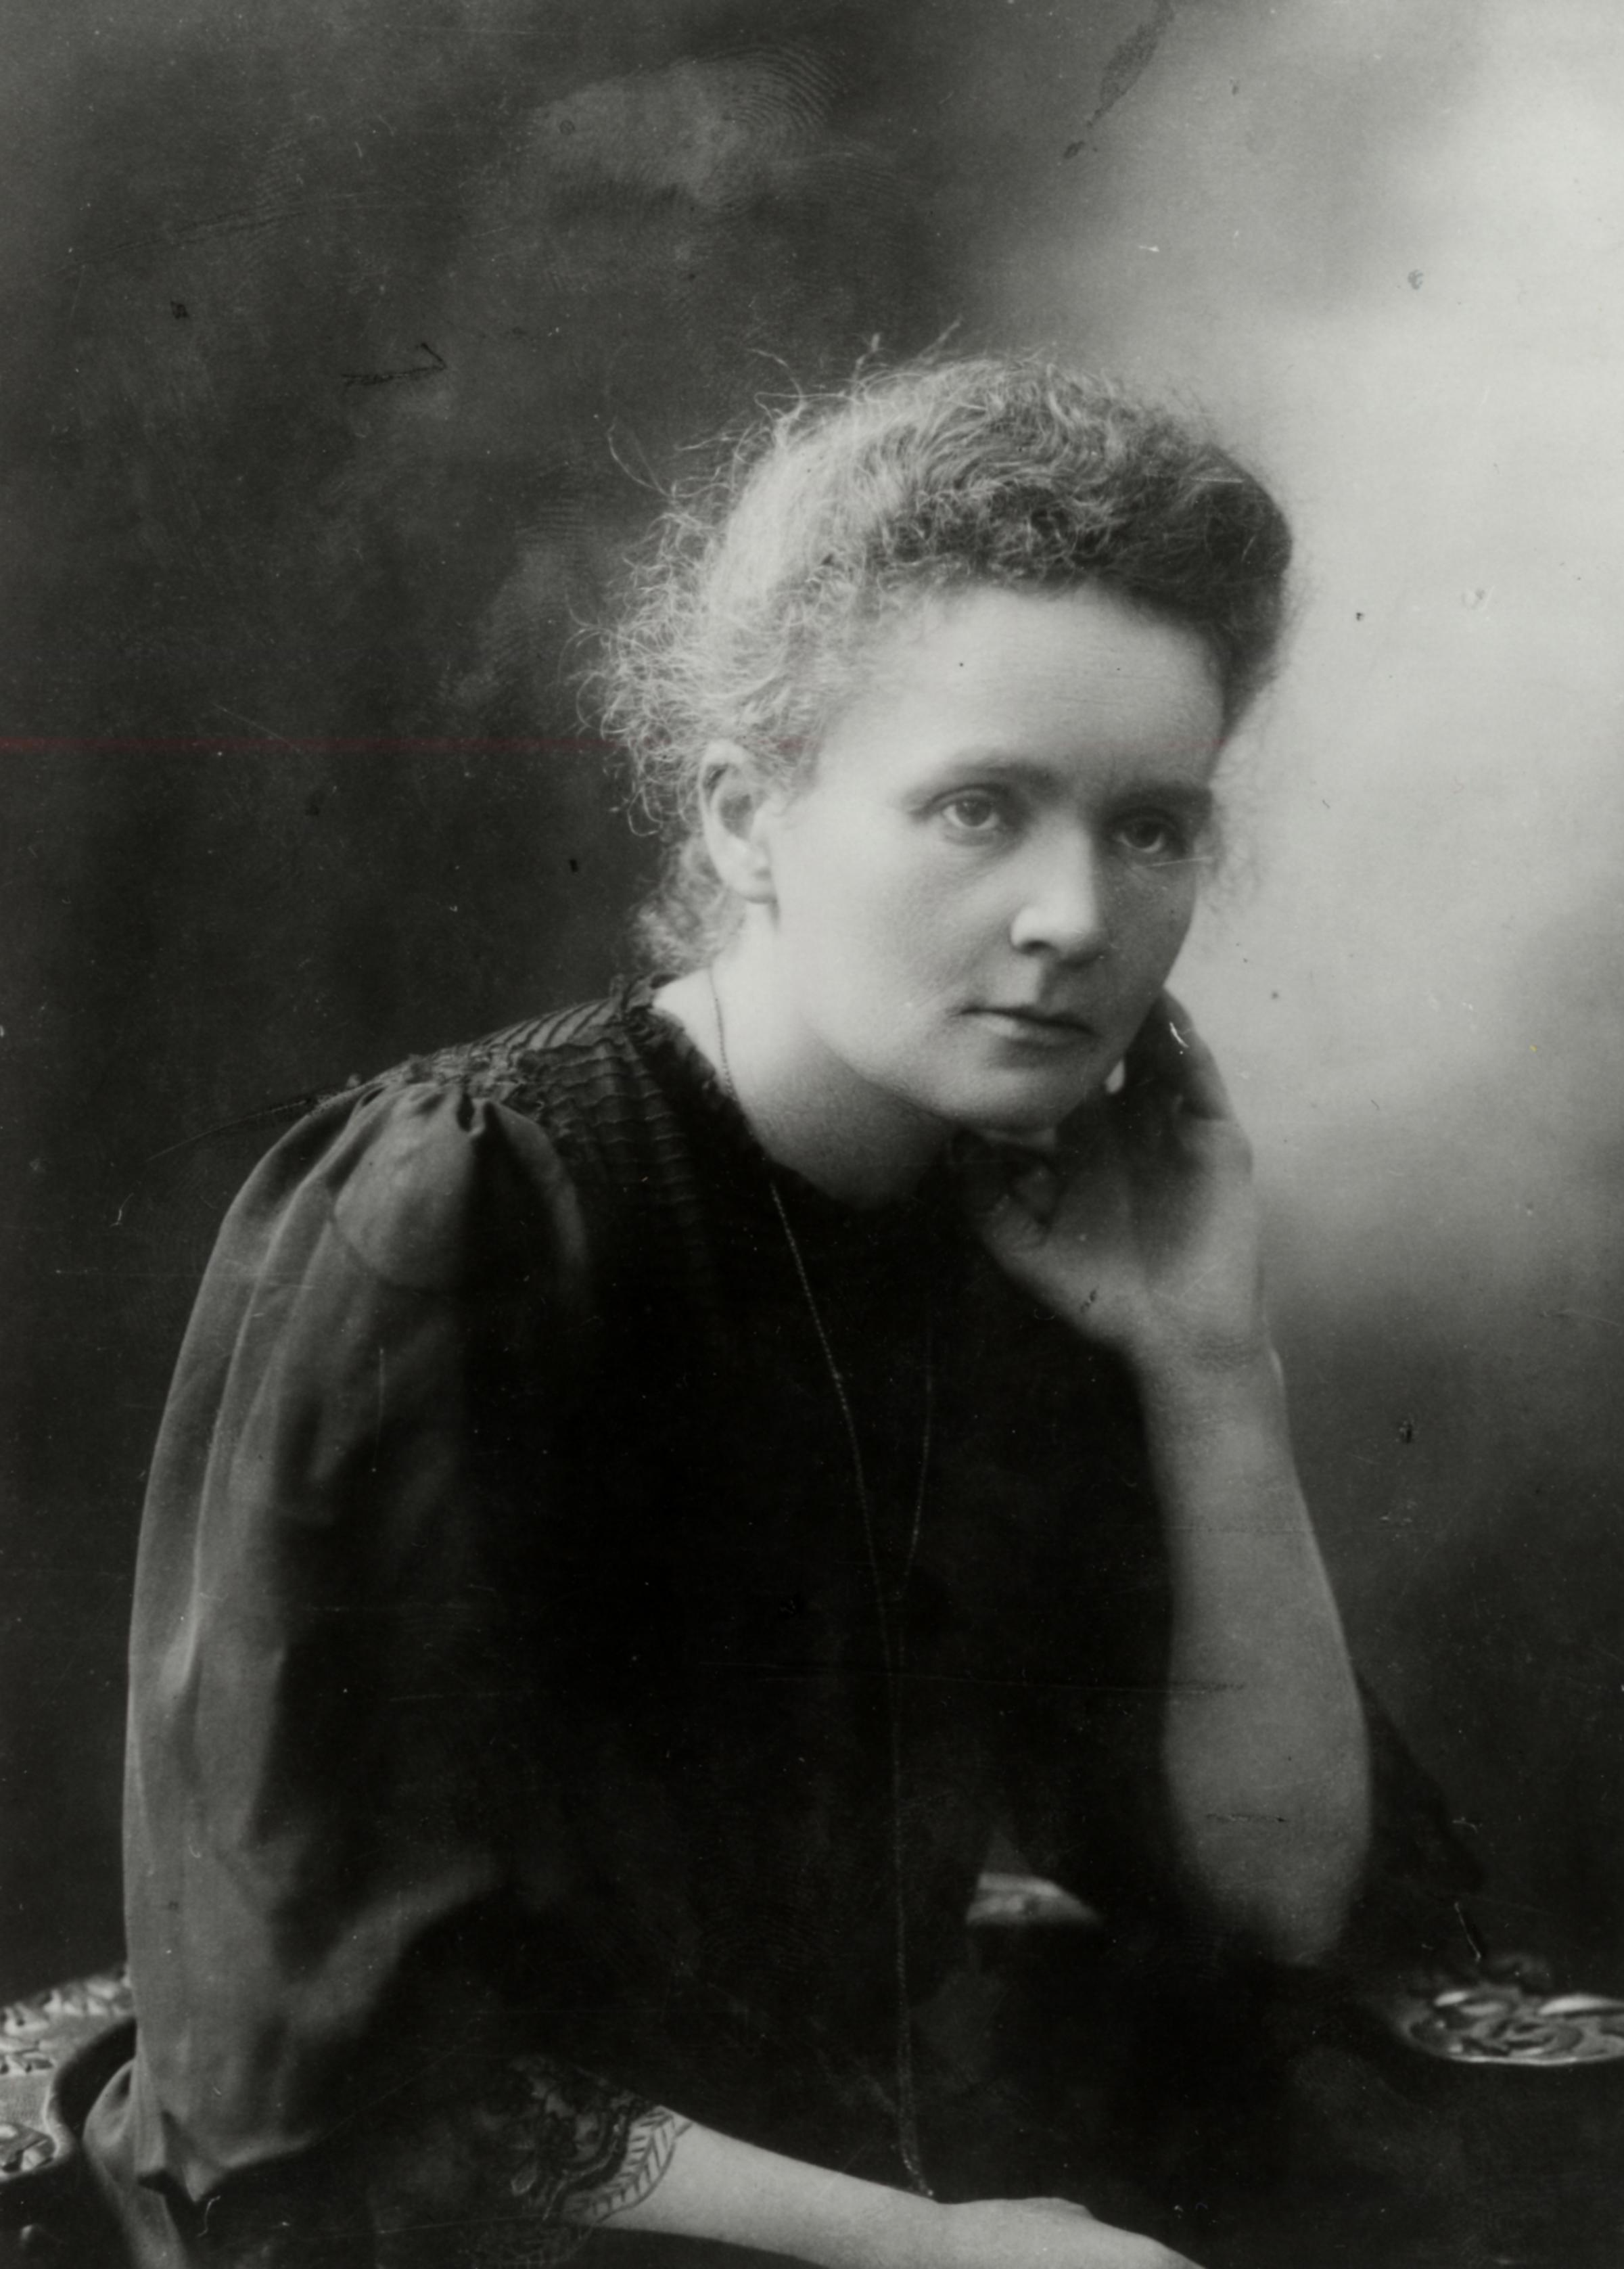 Portrait of Marie Curie